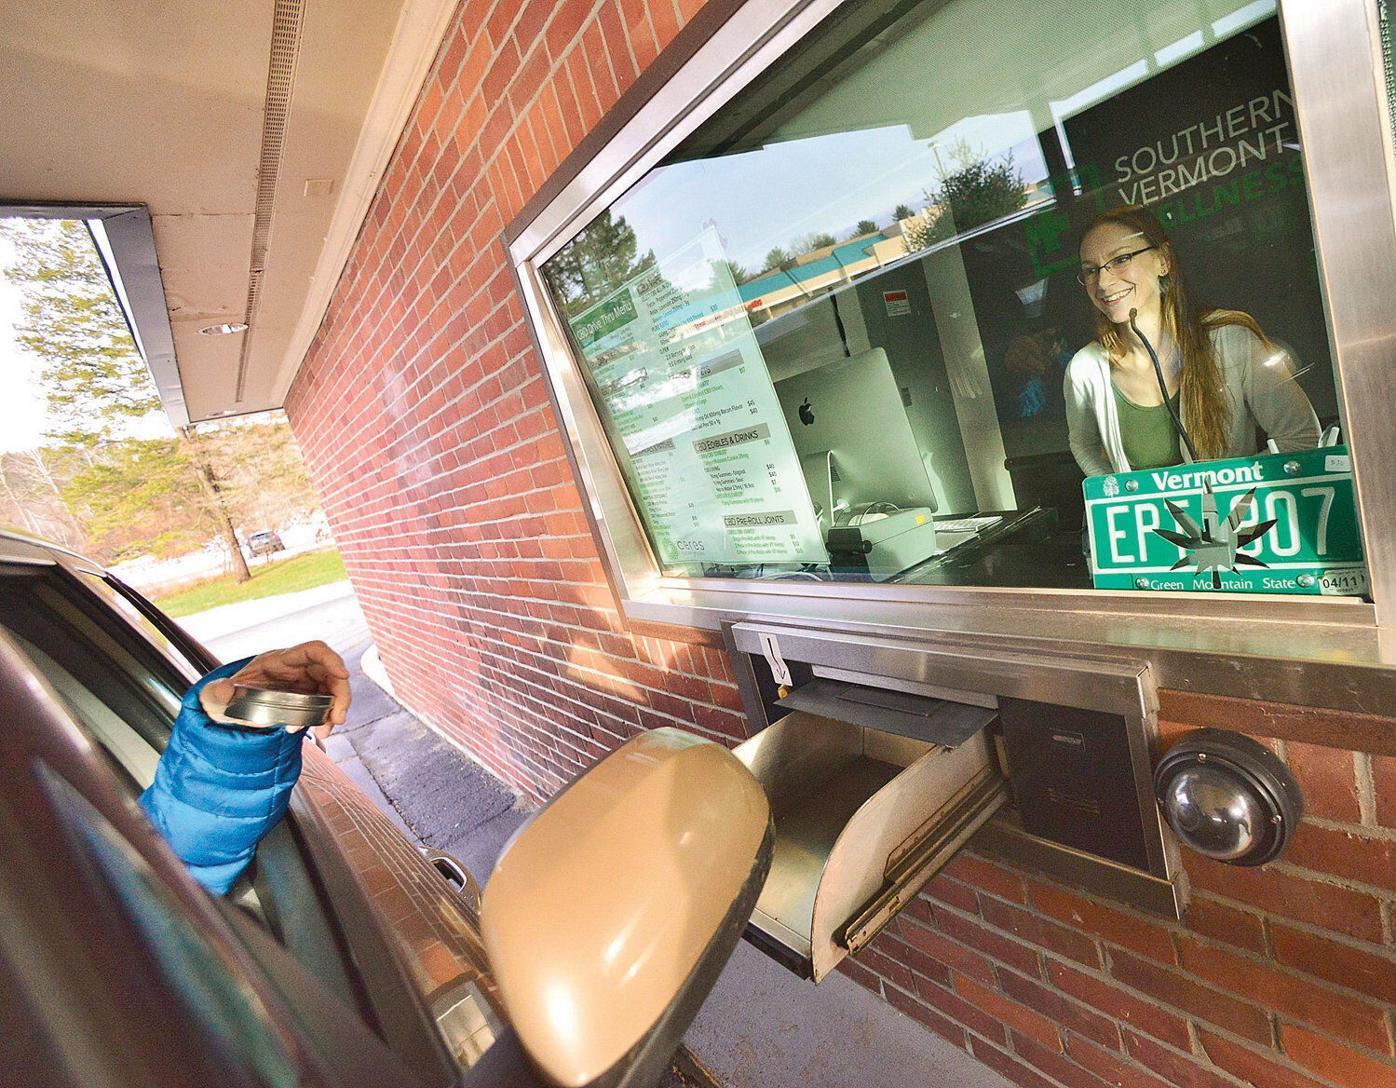 SVW opens medical cannabis drive-thru